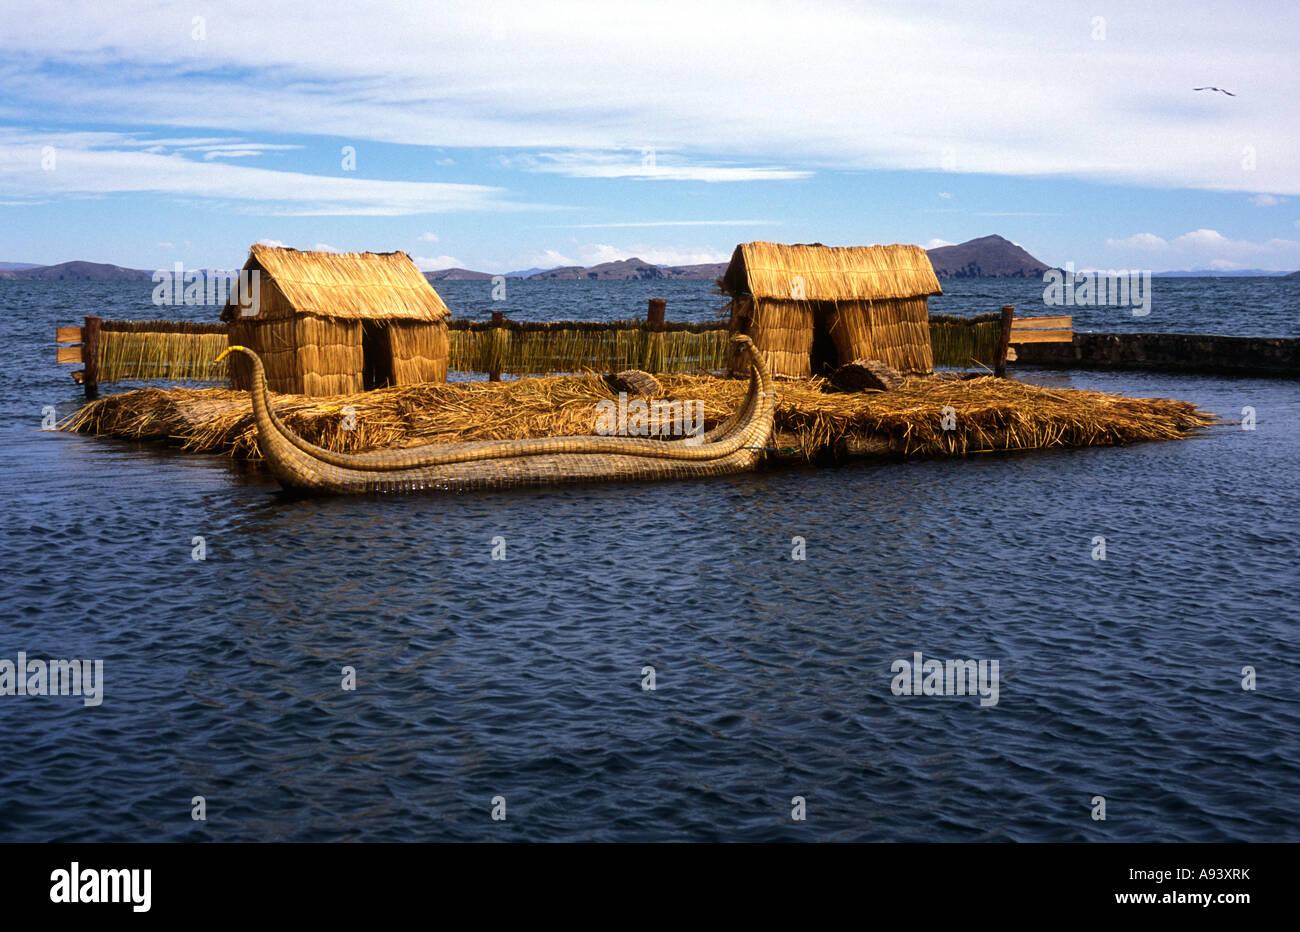 Lake Titikaka Junks, Bolivia - Stock Image